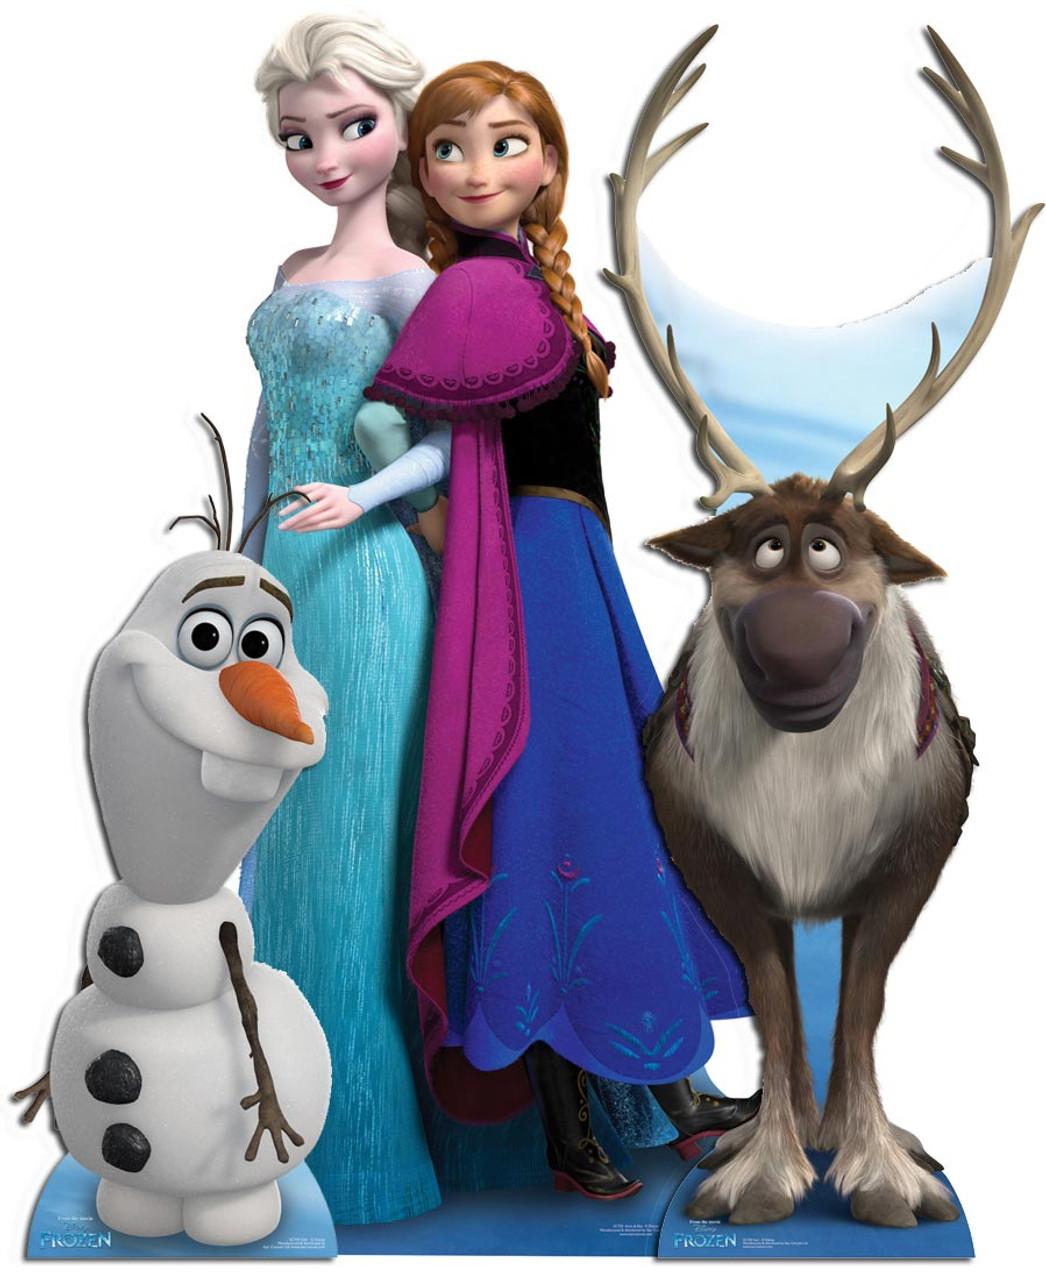 6c10a63f7c3ec Frozen Cardboard Cutout Collection. Buy Disney Frozen standups ...